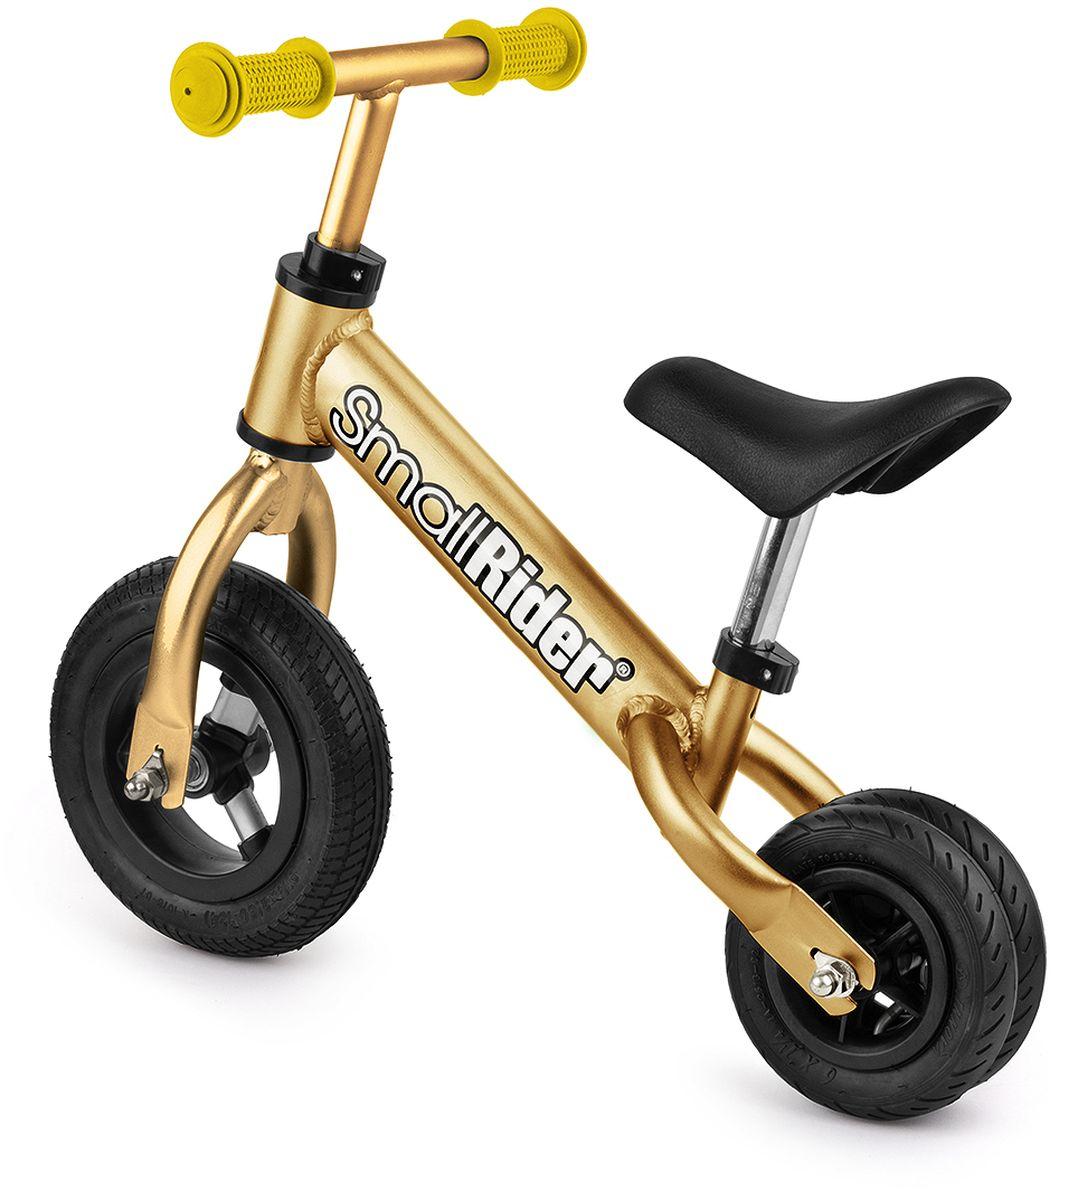 Small RiderБеговел-каталка для малышей Jimmy цвет золотой Small Rider